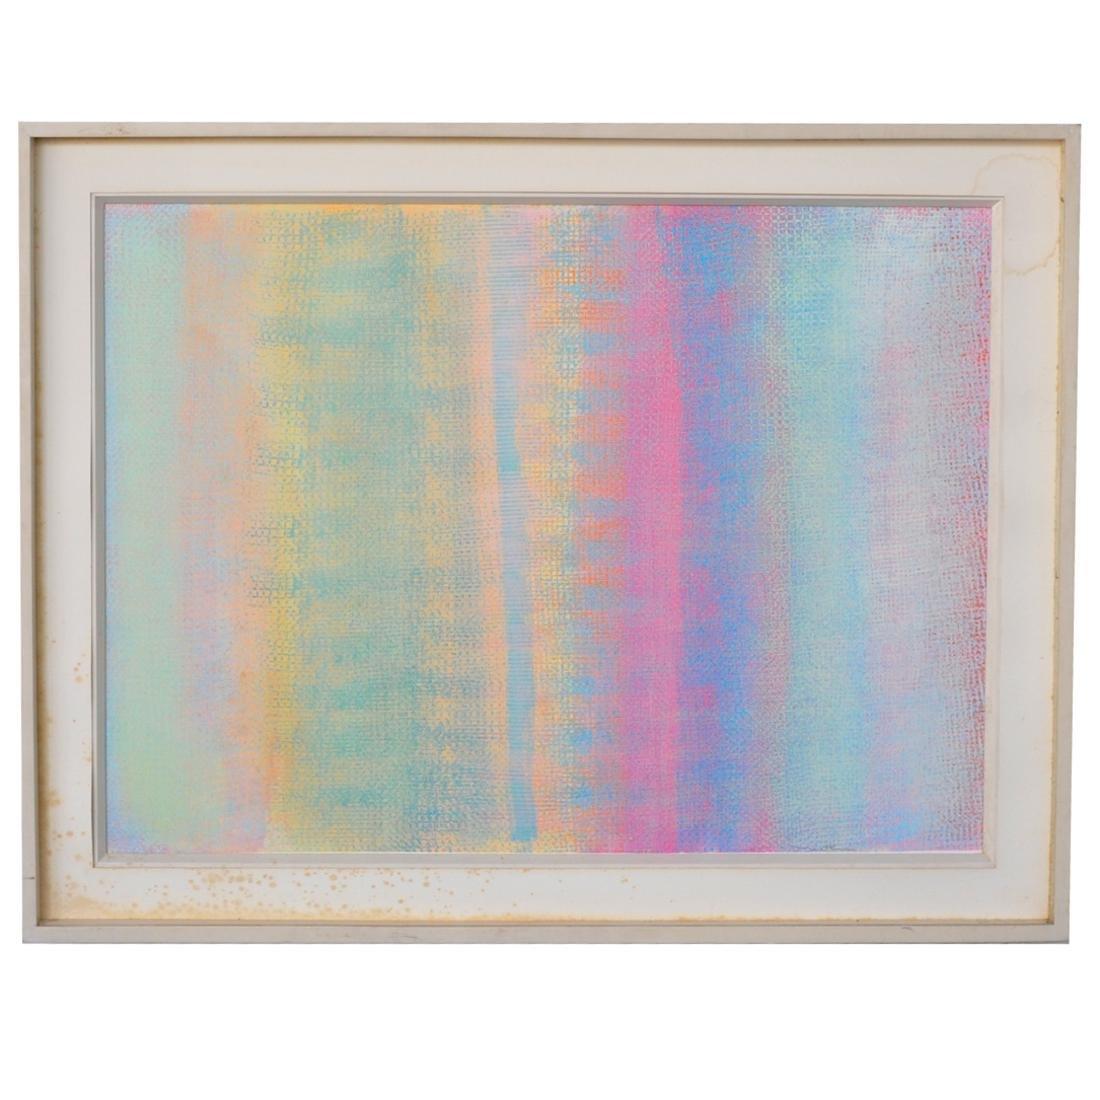 Robert Natkin (American, 1928-2010) Acrylic Painting